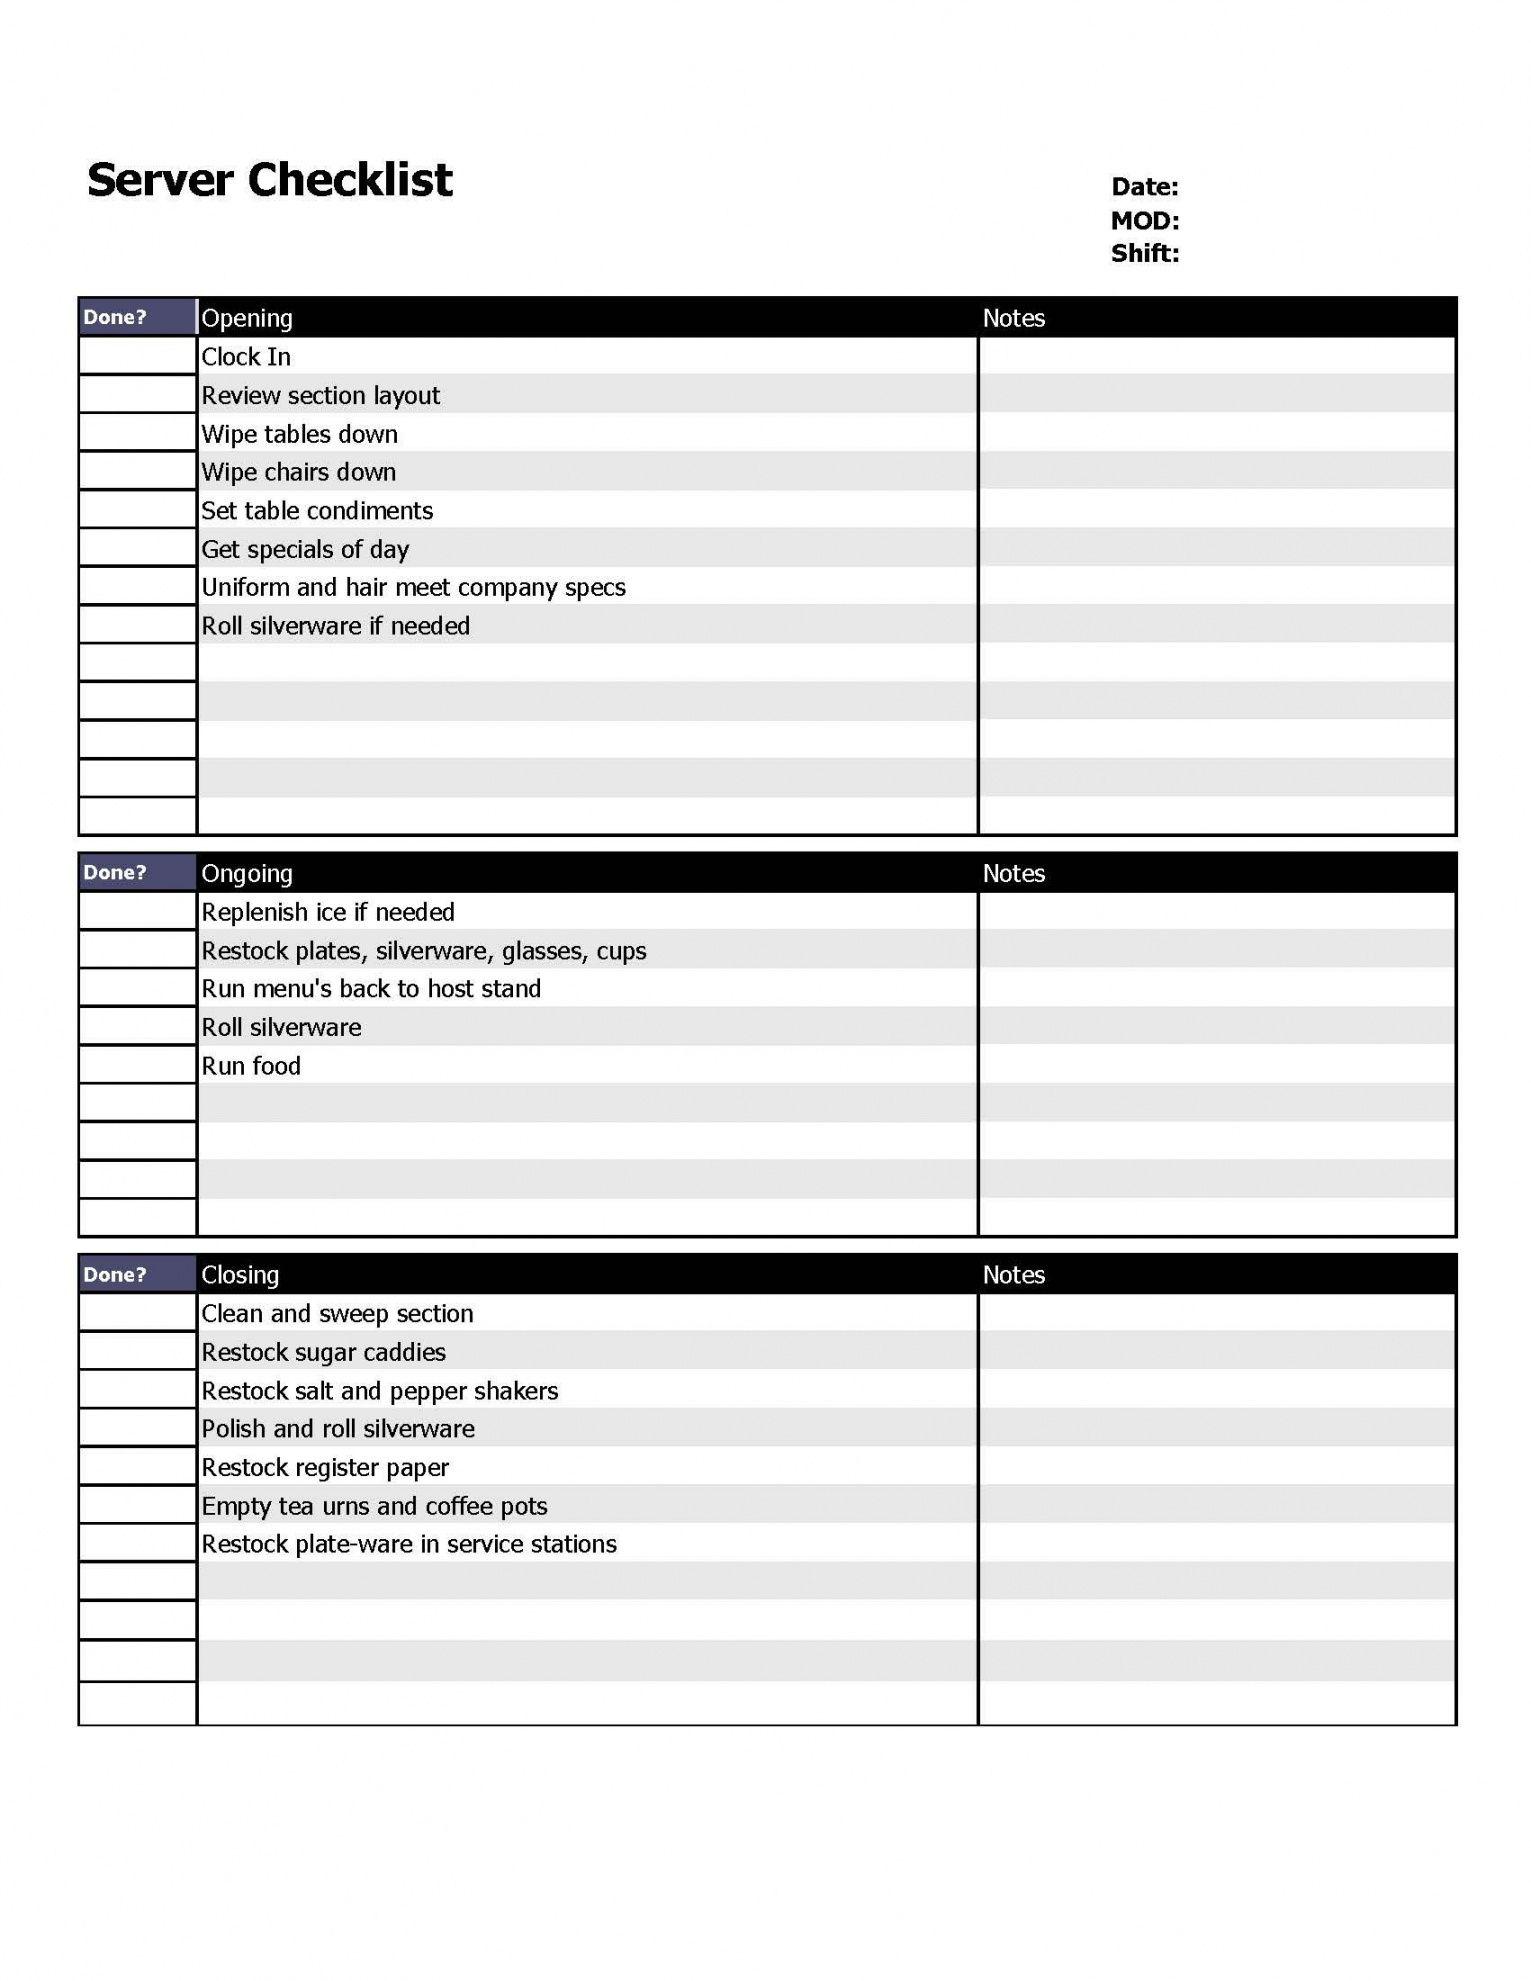 free restaurant server checklist form  organizing  restaurant service uniform checklist template